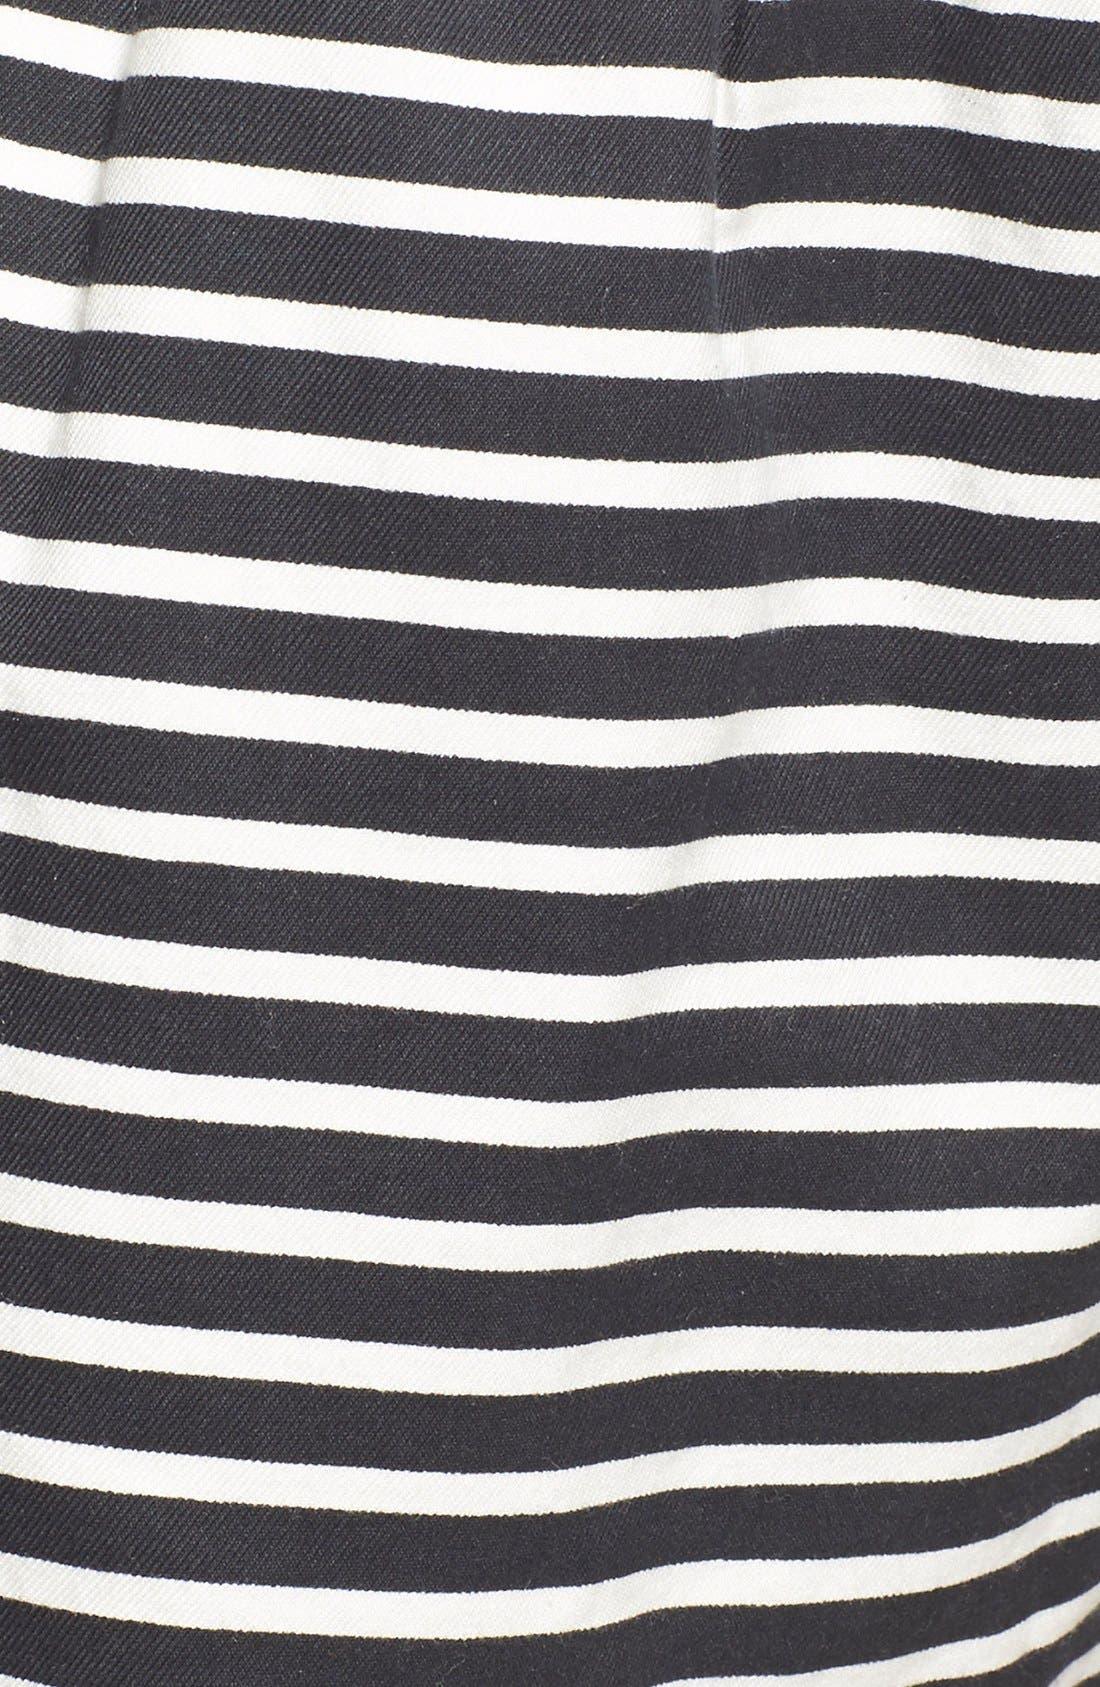 Alternate Image 5  - Billabong 'Road Trippin' Shorts